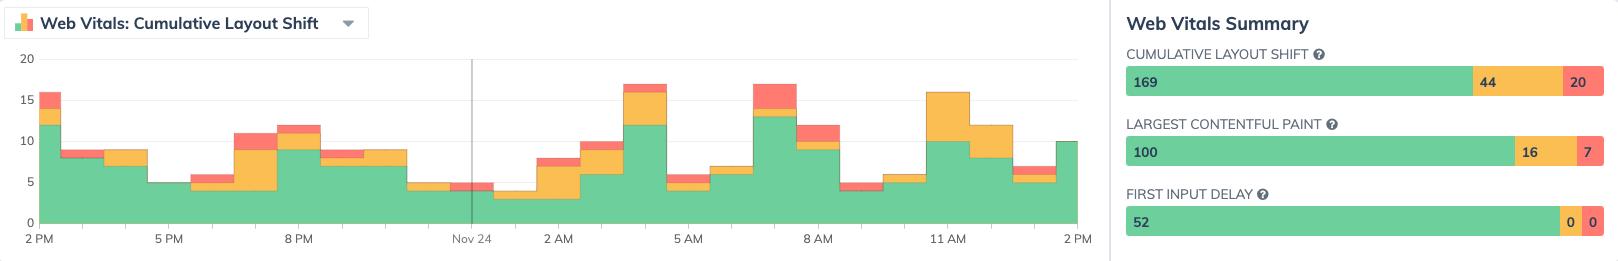 Web Vital histogram chart from Request Metrics